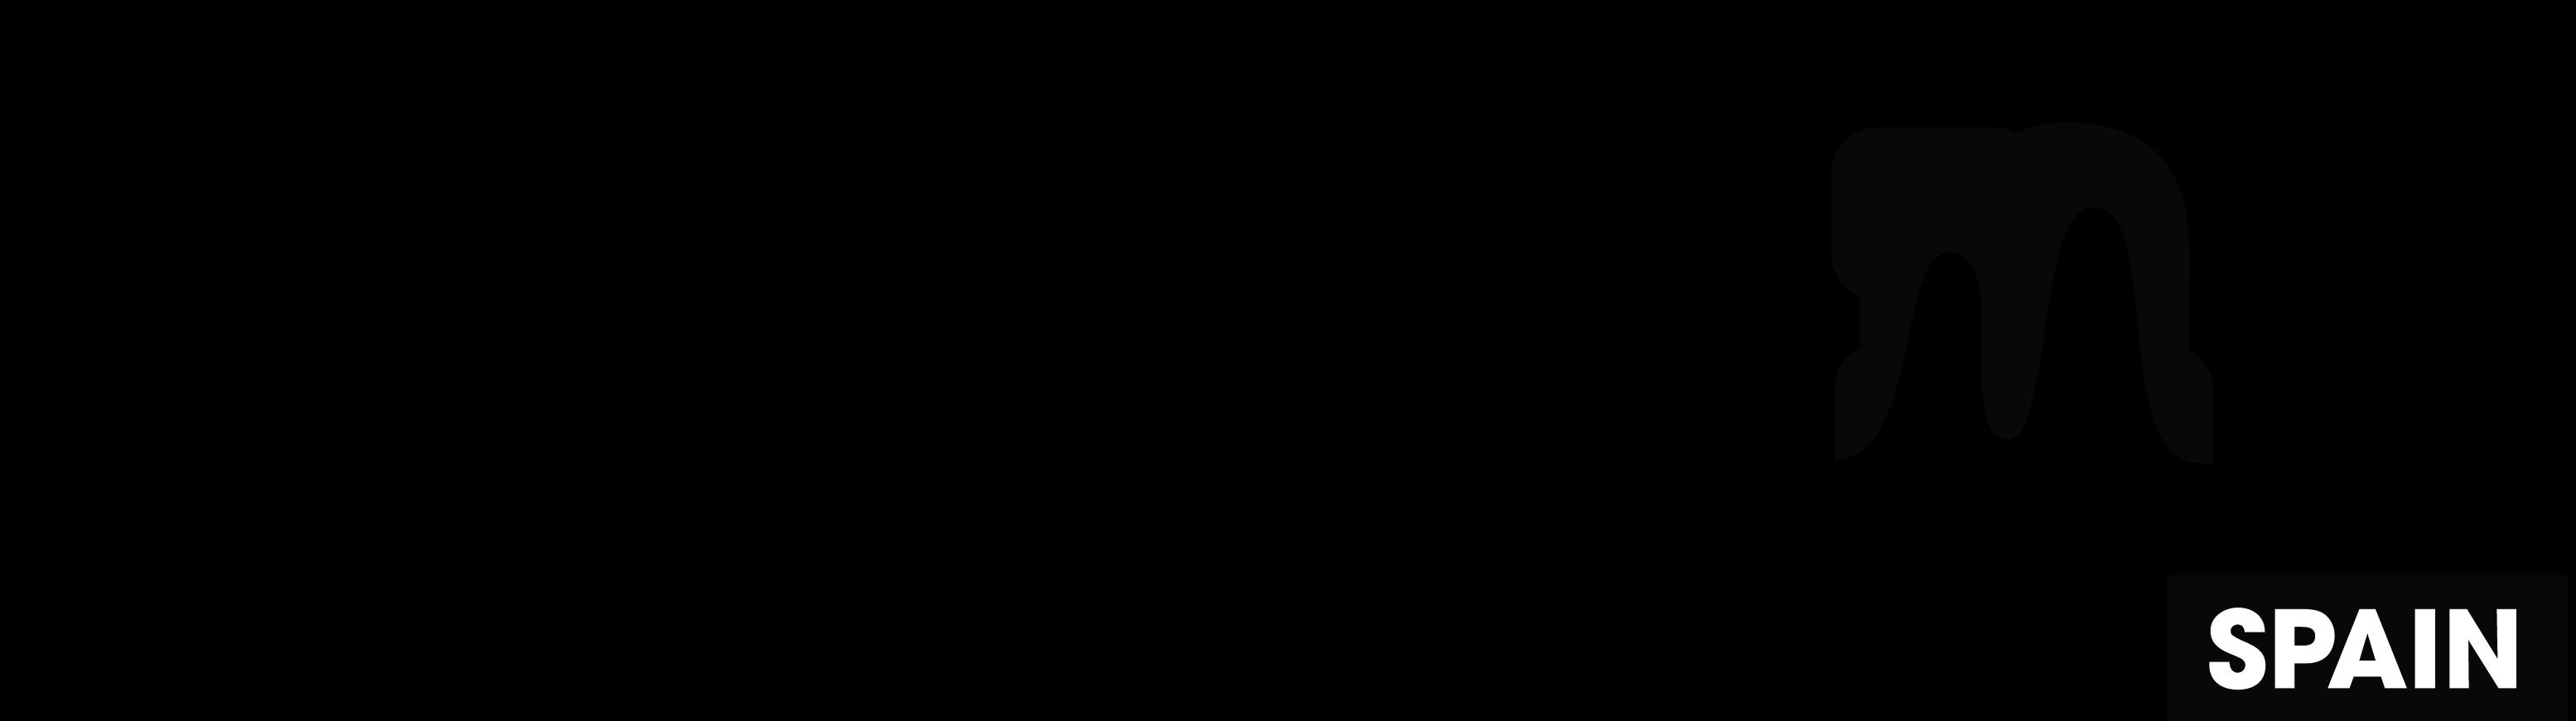 Imagine Spain Logo